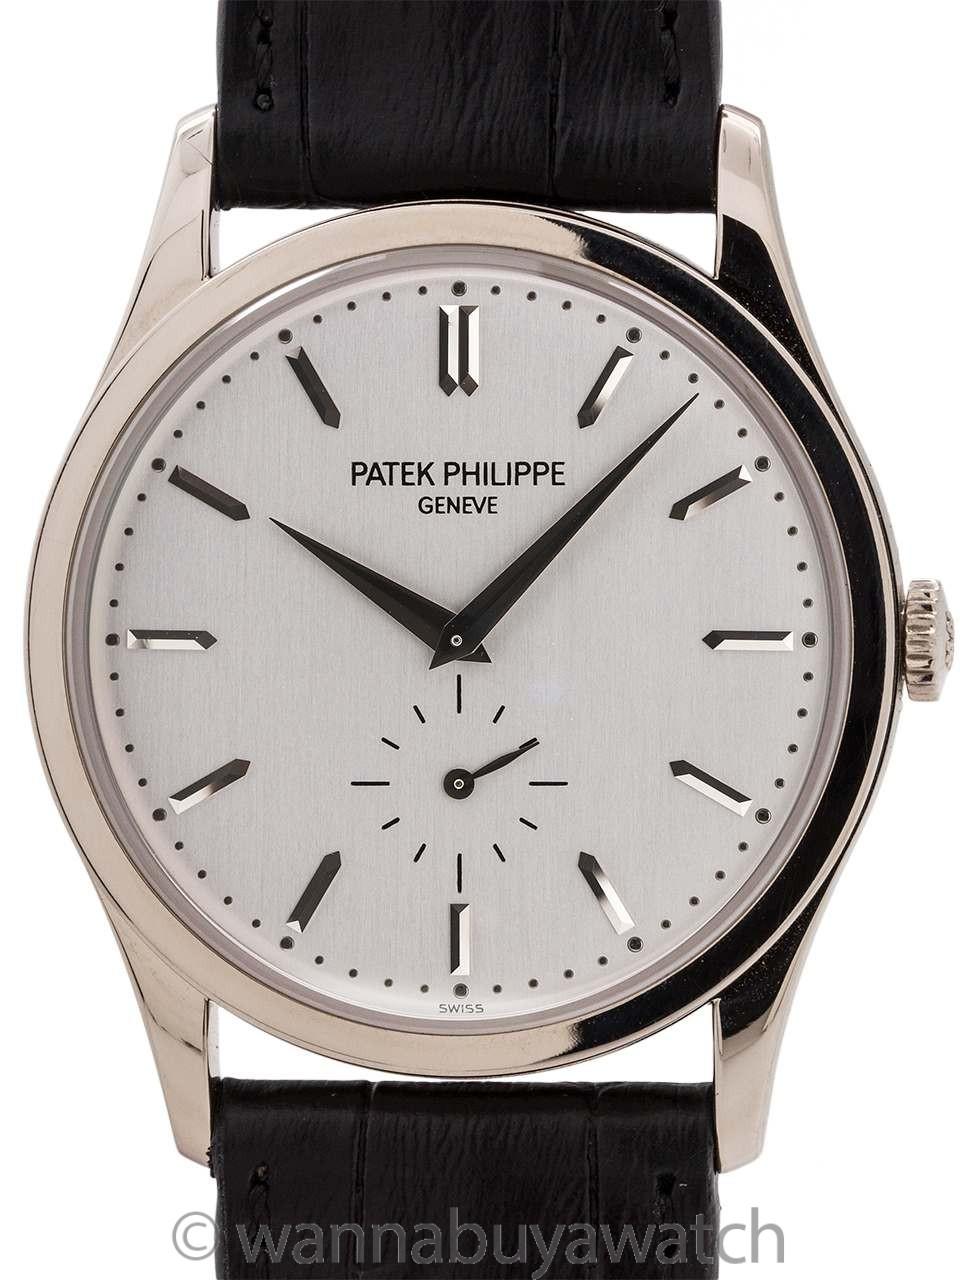 Patek Philippe 18K White Gold Calatrava ref 5196G Box & Papers